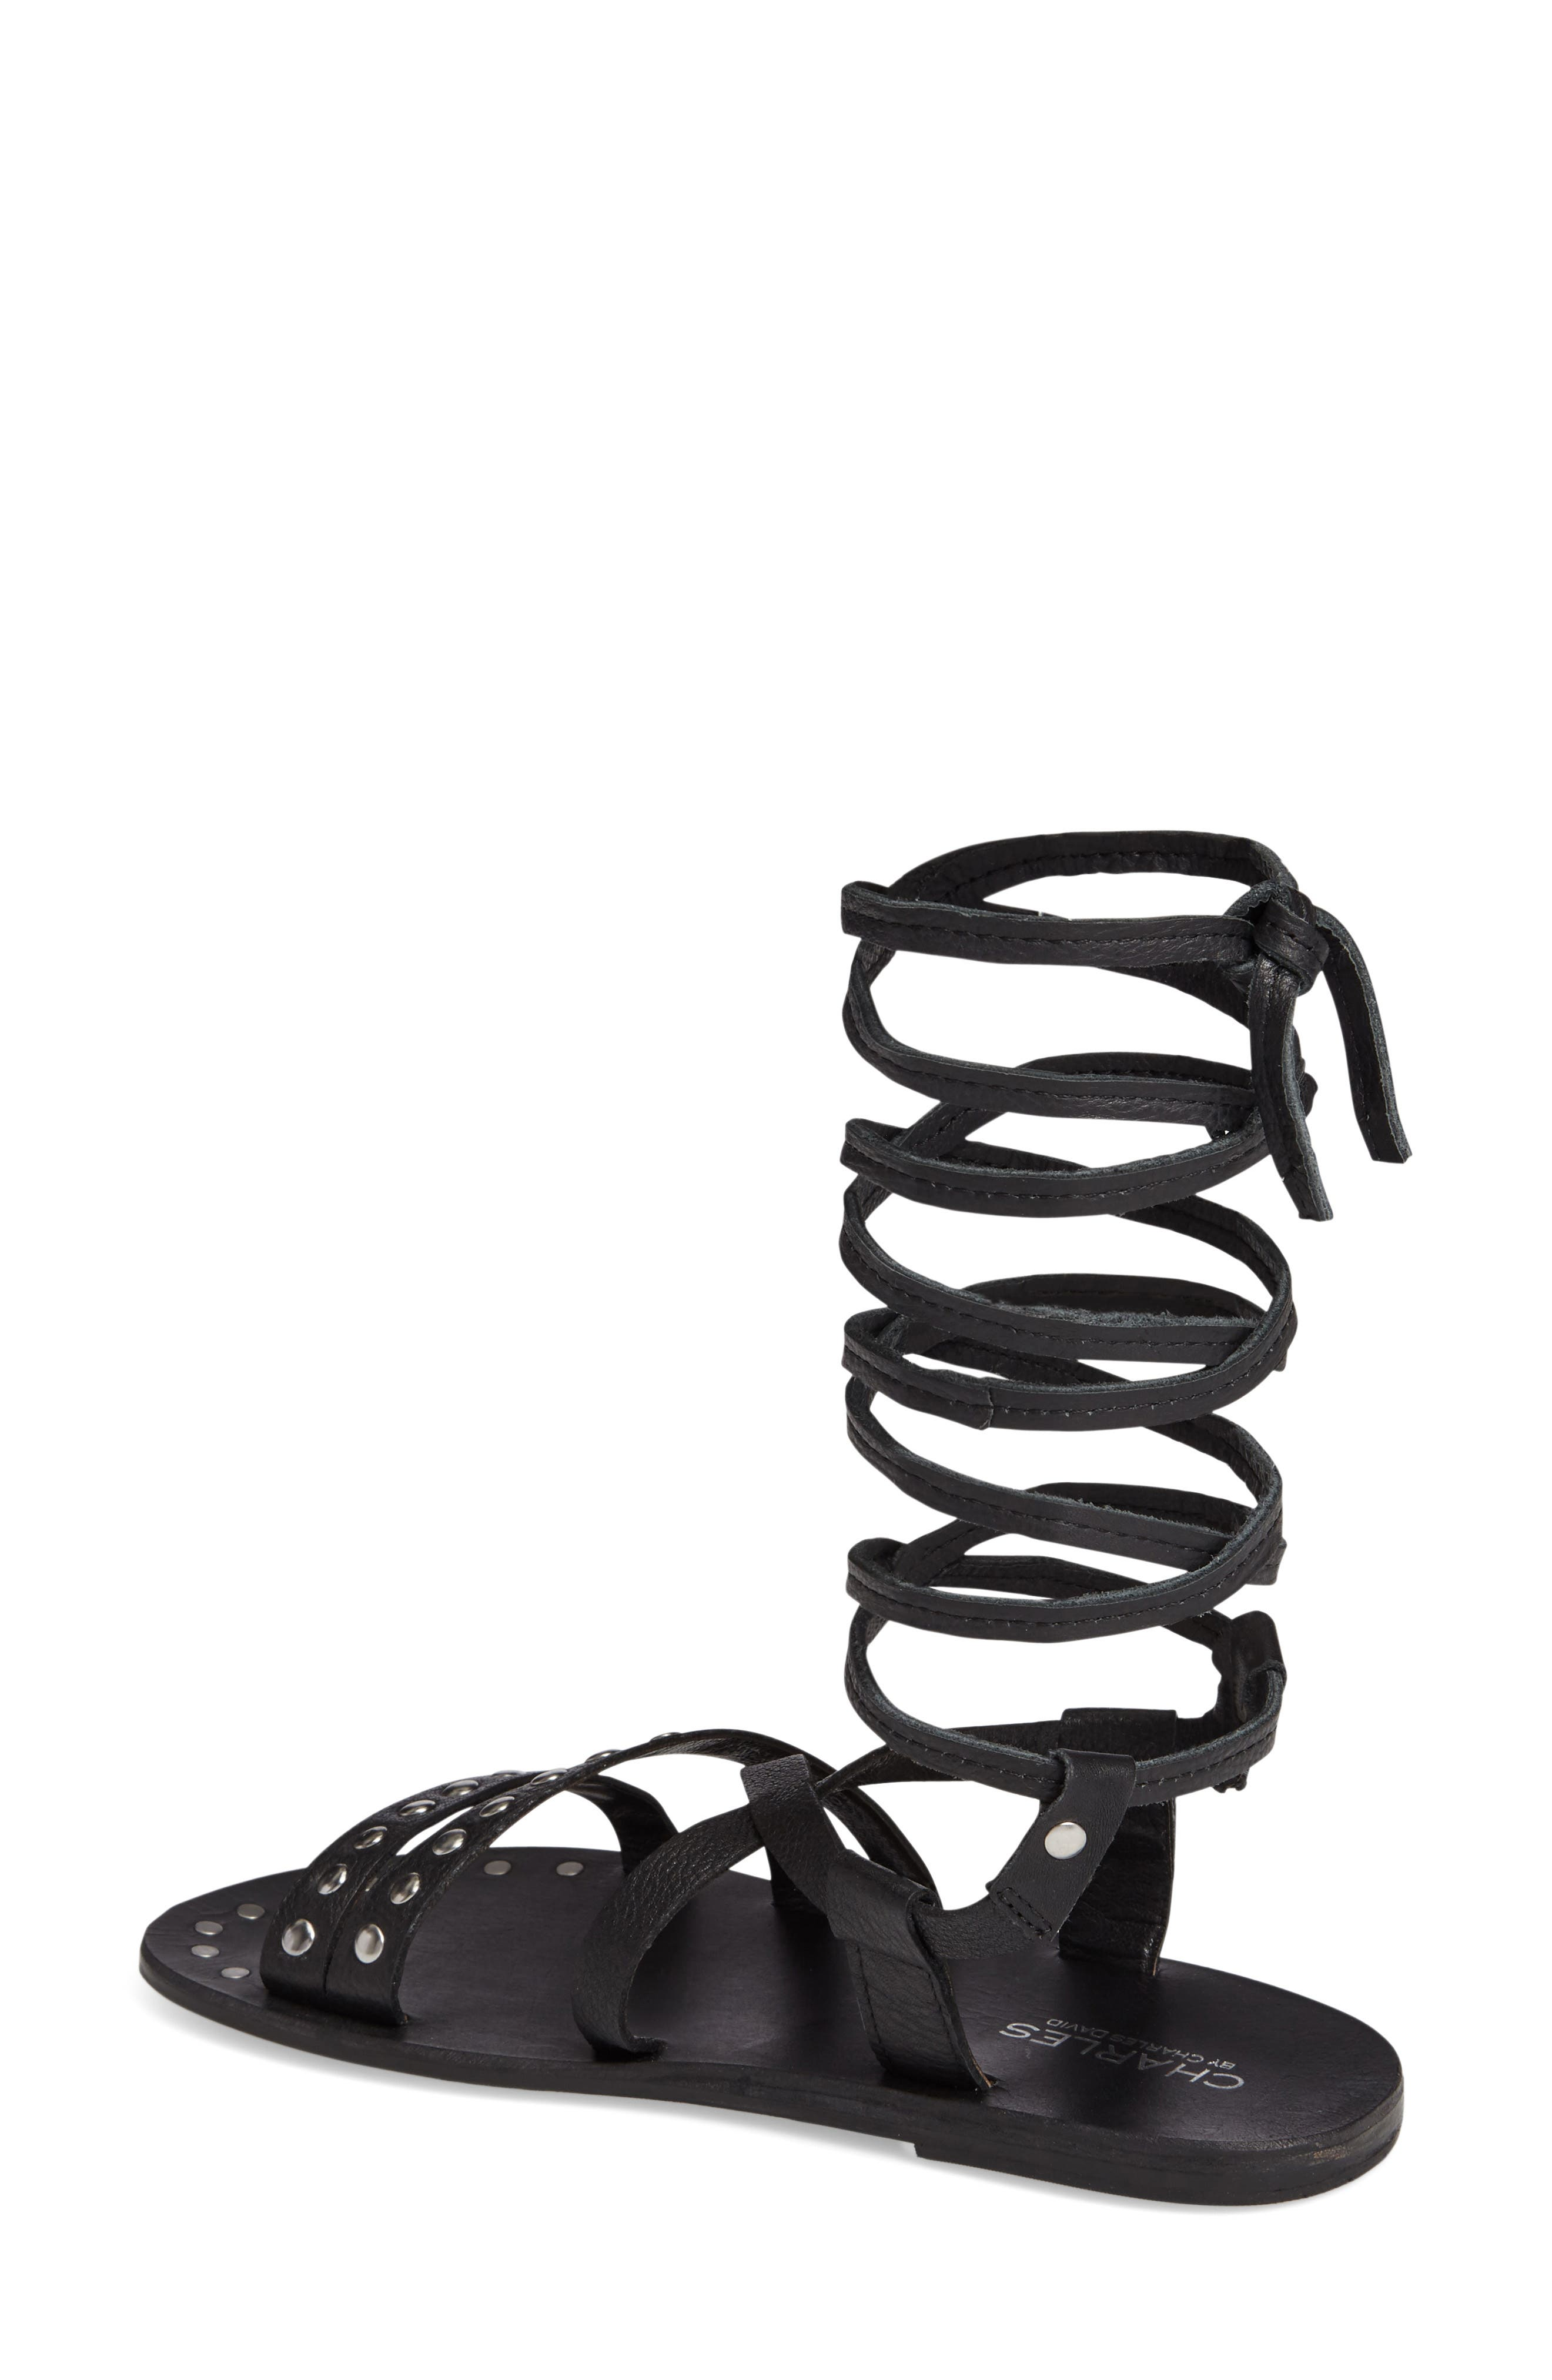 Steeler Ankle Wrap Sandal,                             Alternate thumbnail 2, color,                             001